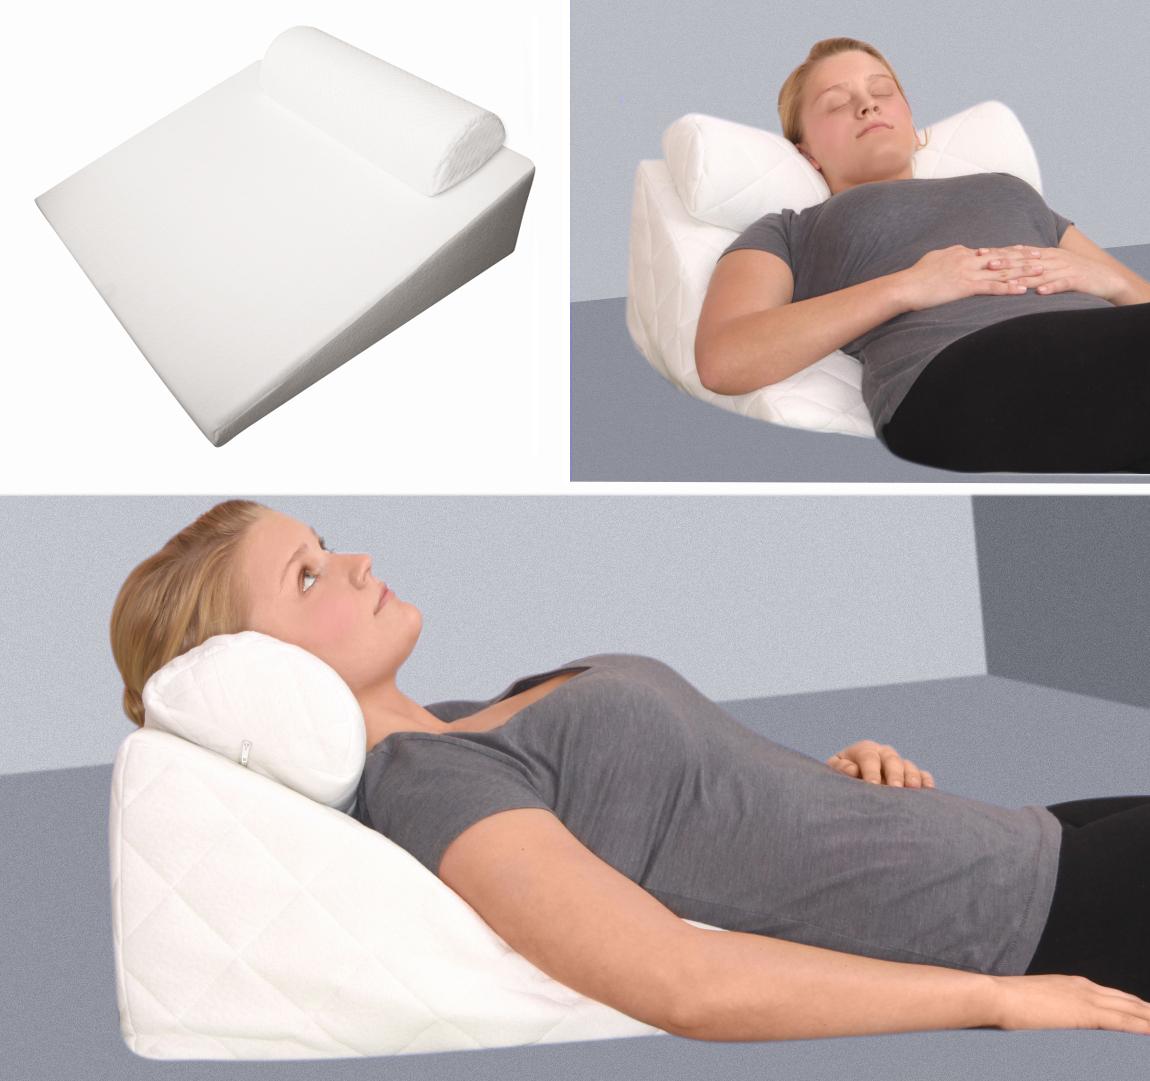 gel foam mini wedge pillow reflux raising reading pillow with neck roll hardness 1 2 soft medium